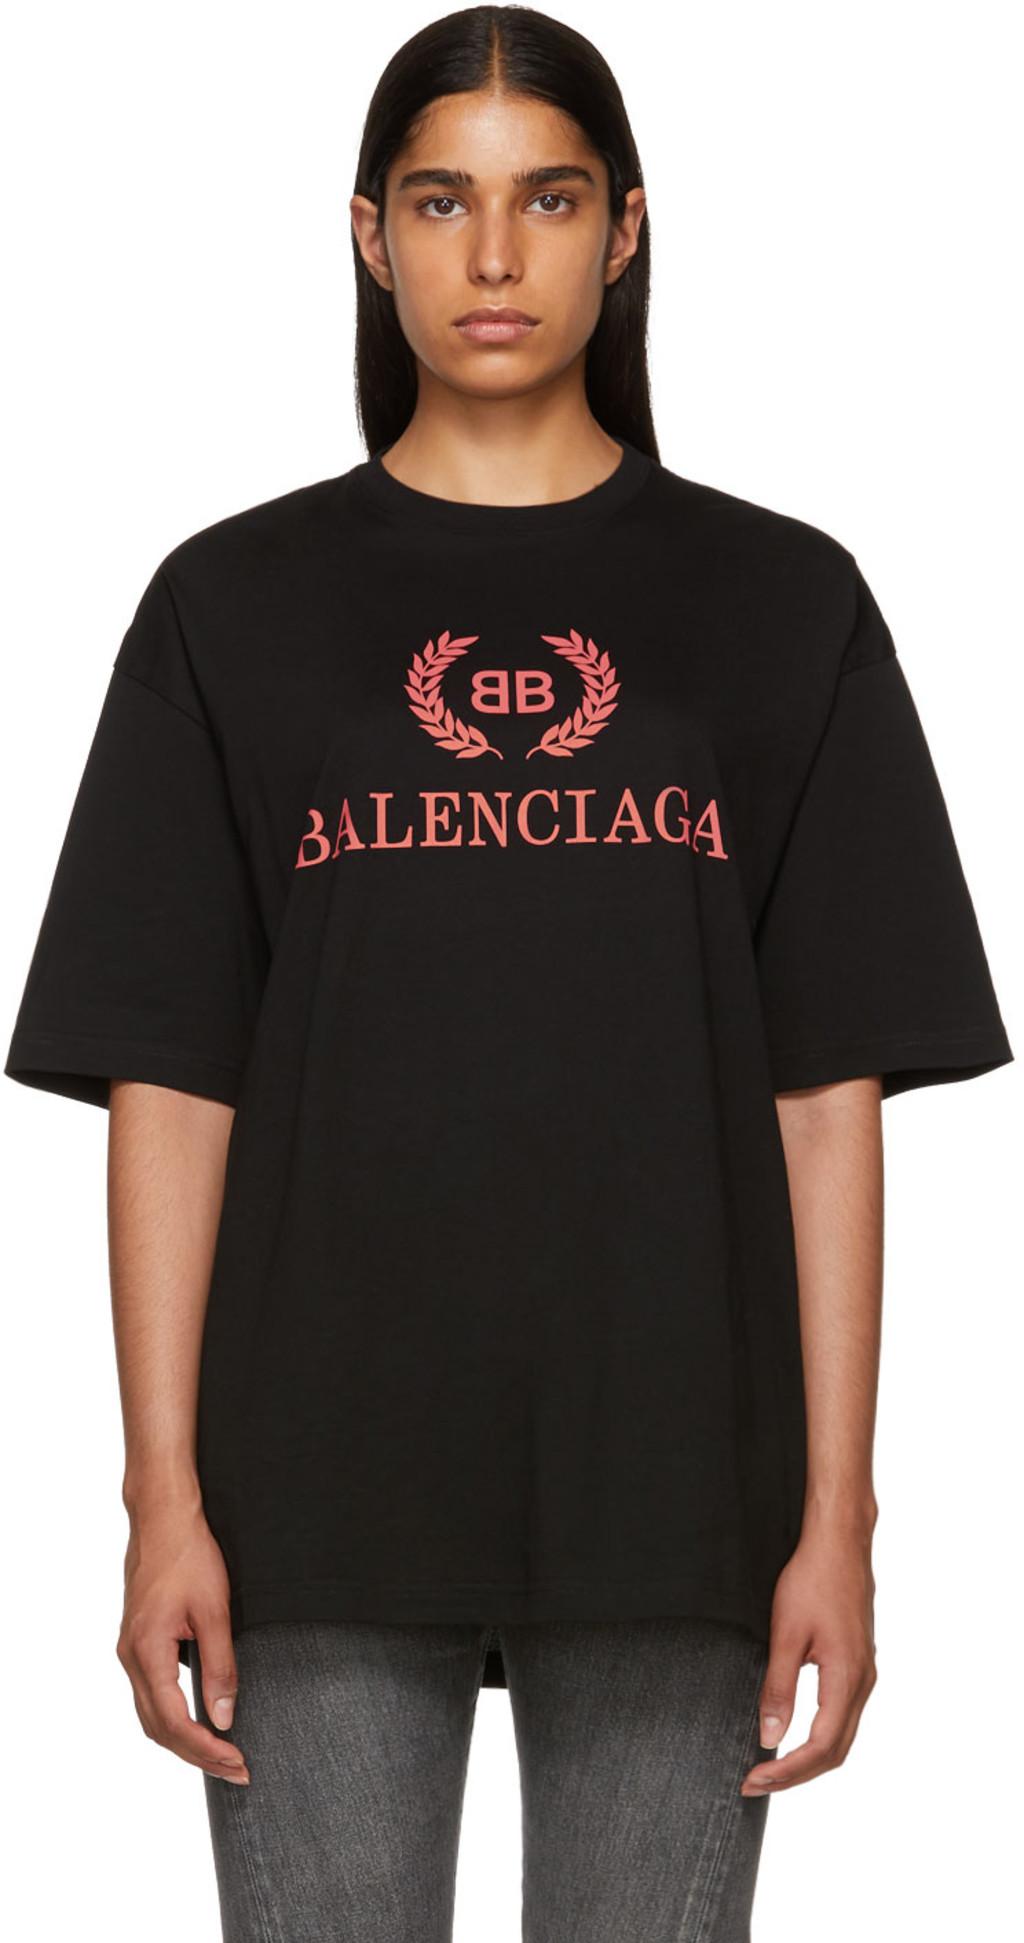 c1a14e11 Balenciaga t-shirts for Women | SSENSE